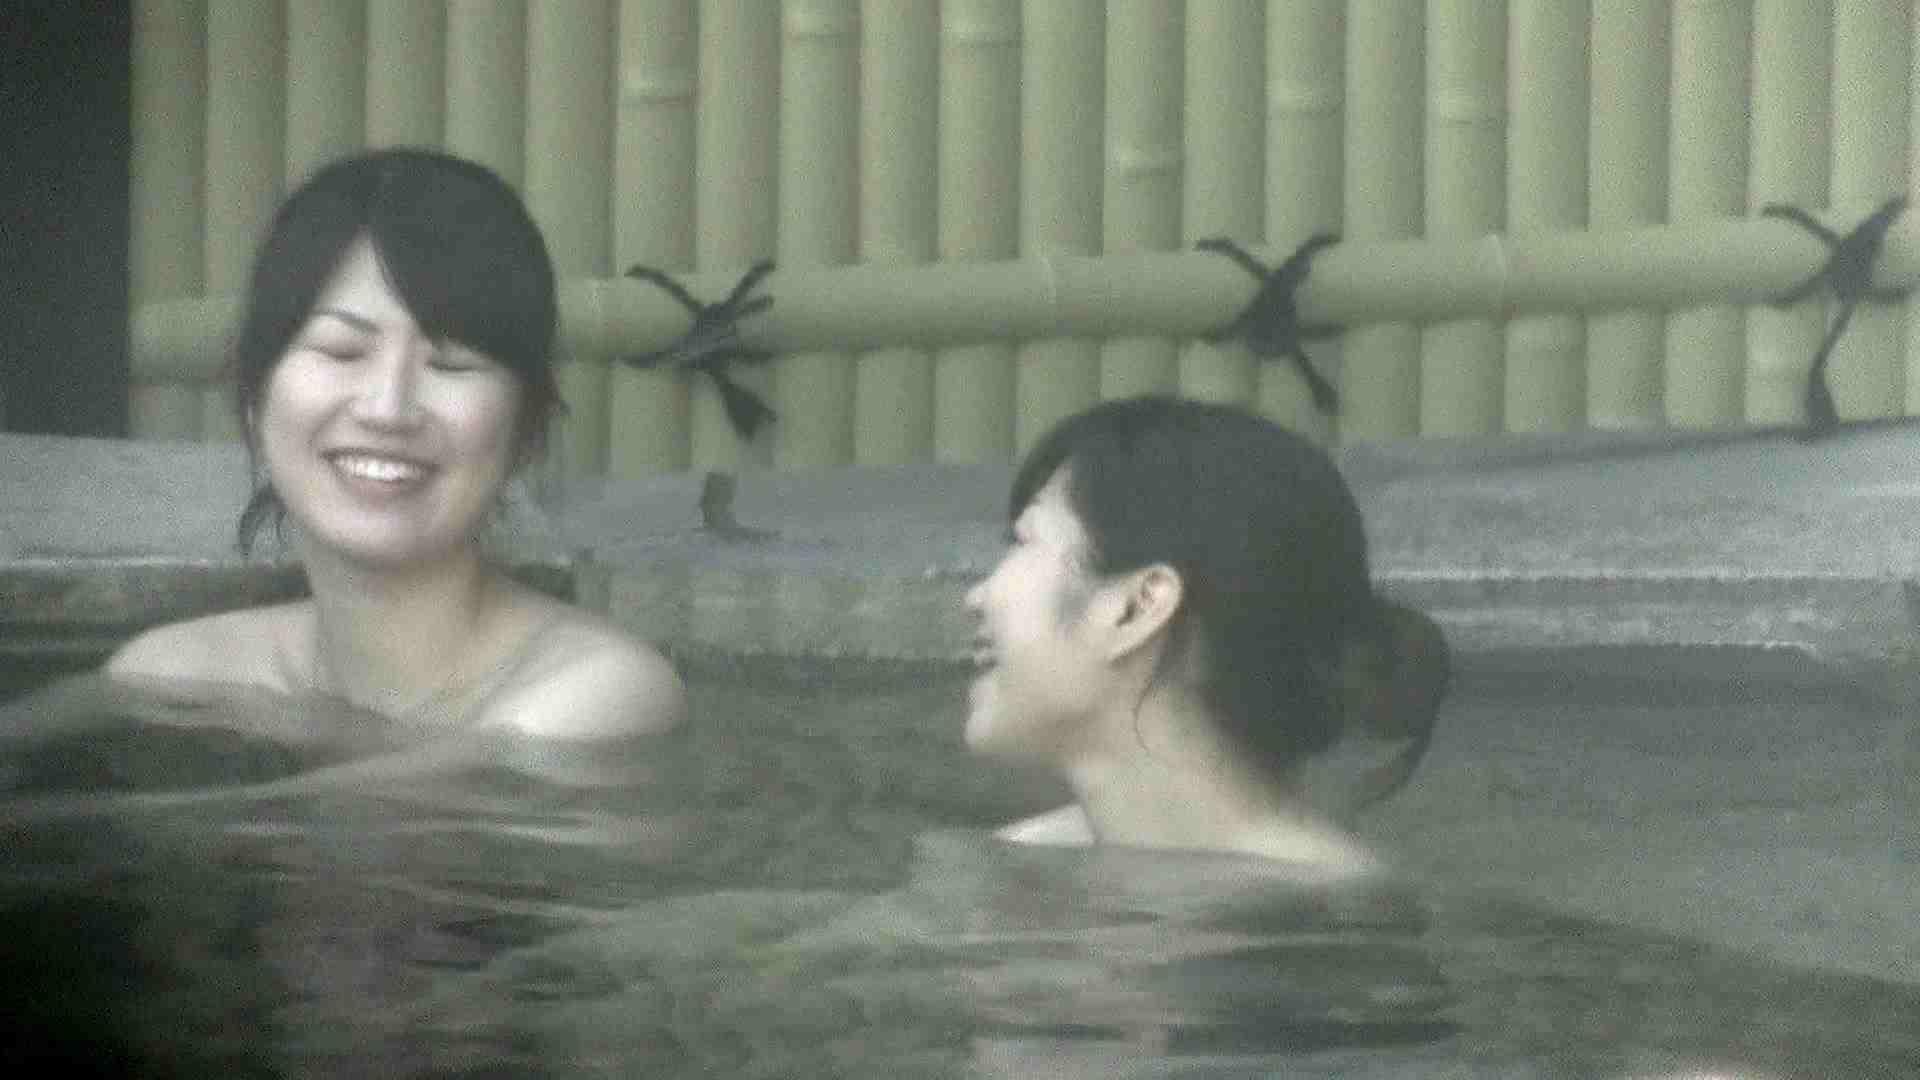 Aquaな露天風呂Vol.206 露天 | HなOL  74pic 2